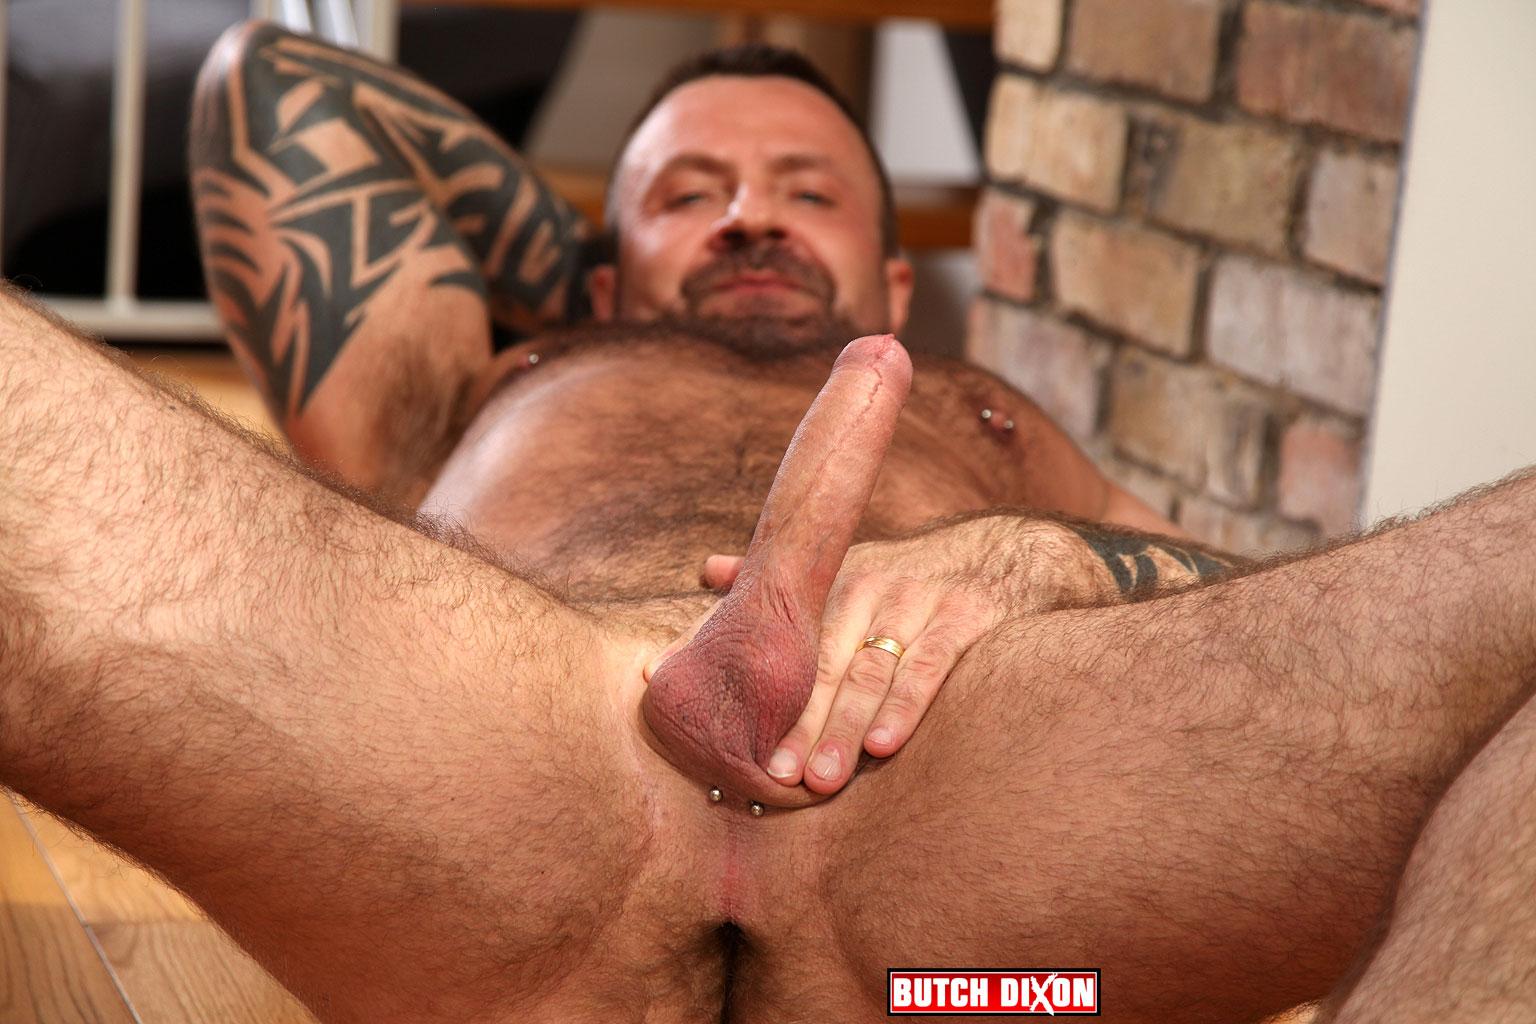 Butch-Dixon-Marc-Angelo-Muscle-Bear-Masturbating-Big-Uncut-Cock-Amateur-Gay-Porn-04 Hairy Canadian Muscle Daddy Bear Strokes His Big Uncut Cock